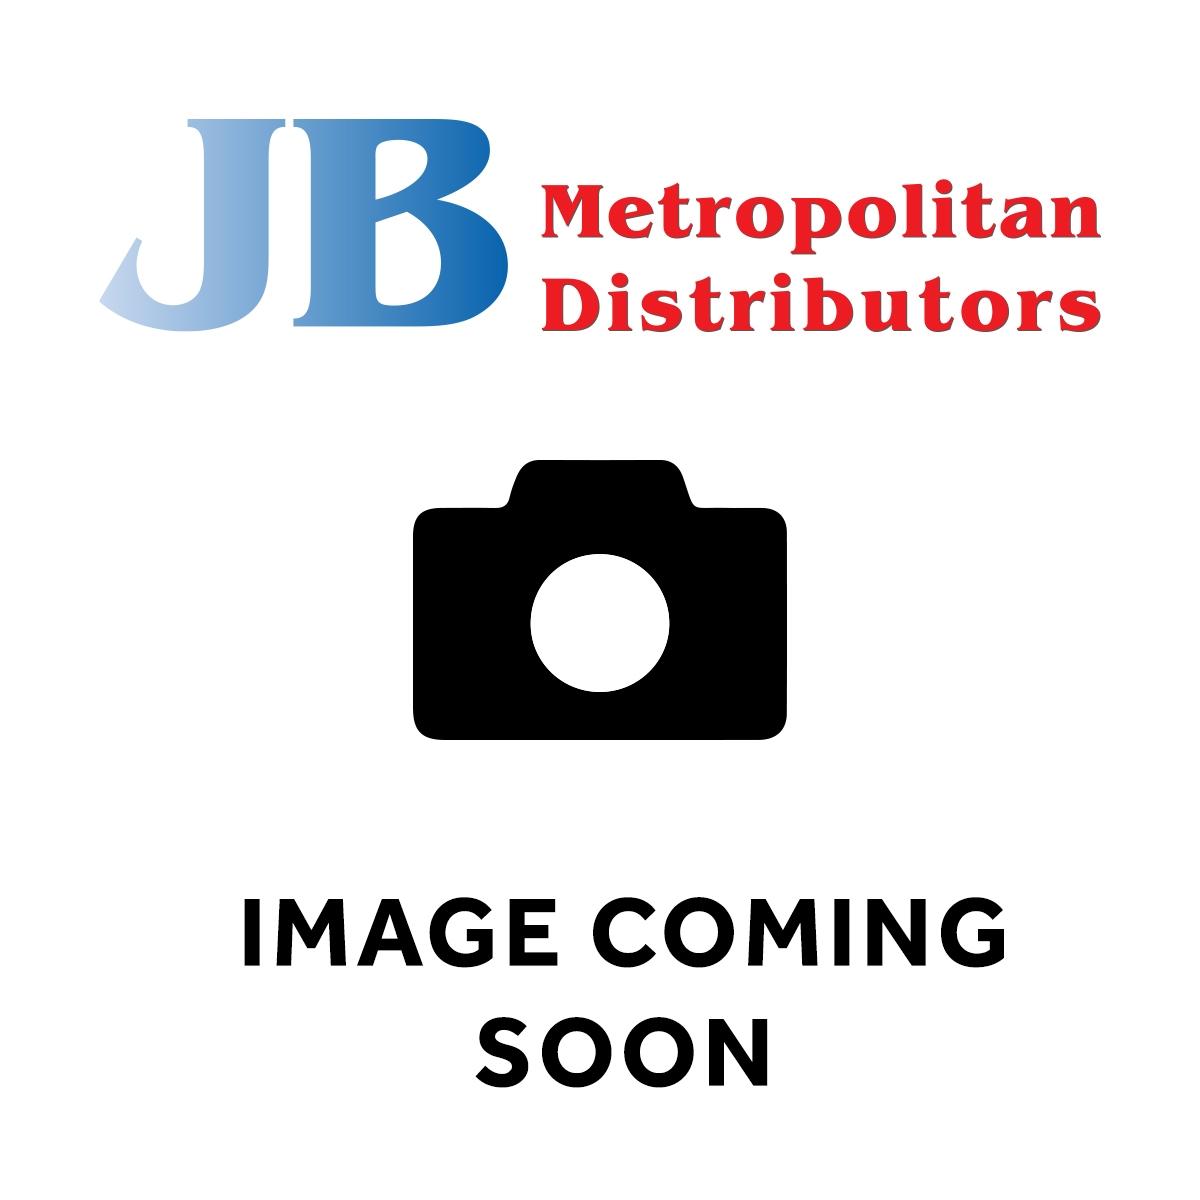 80G GRAINWAVES BEETROOT & CHILLI